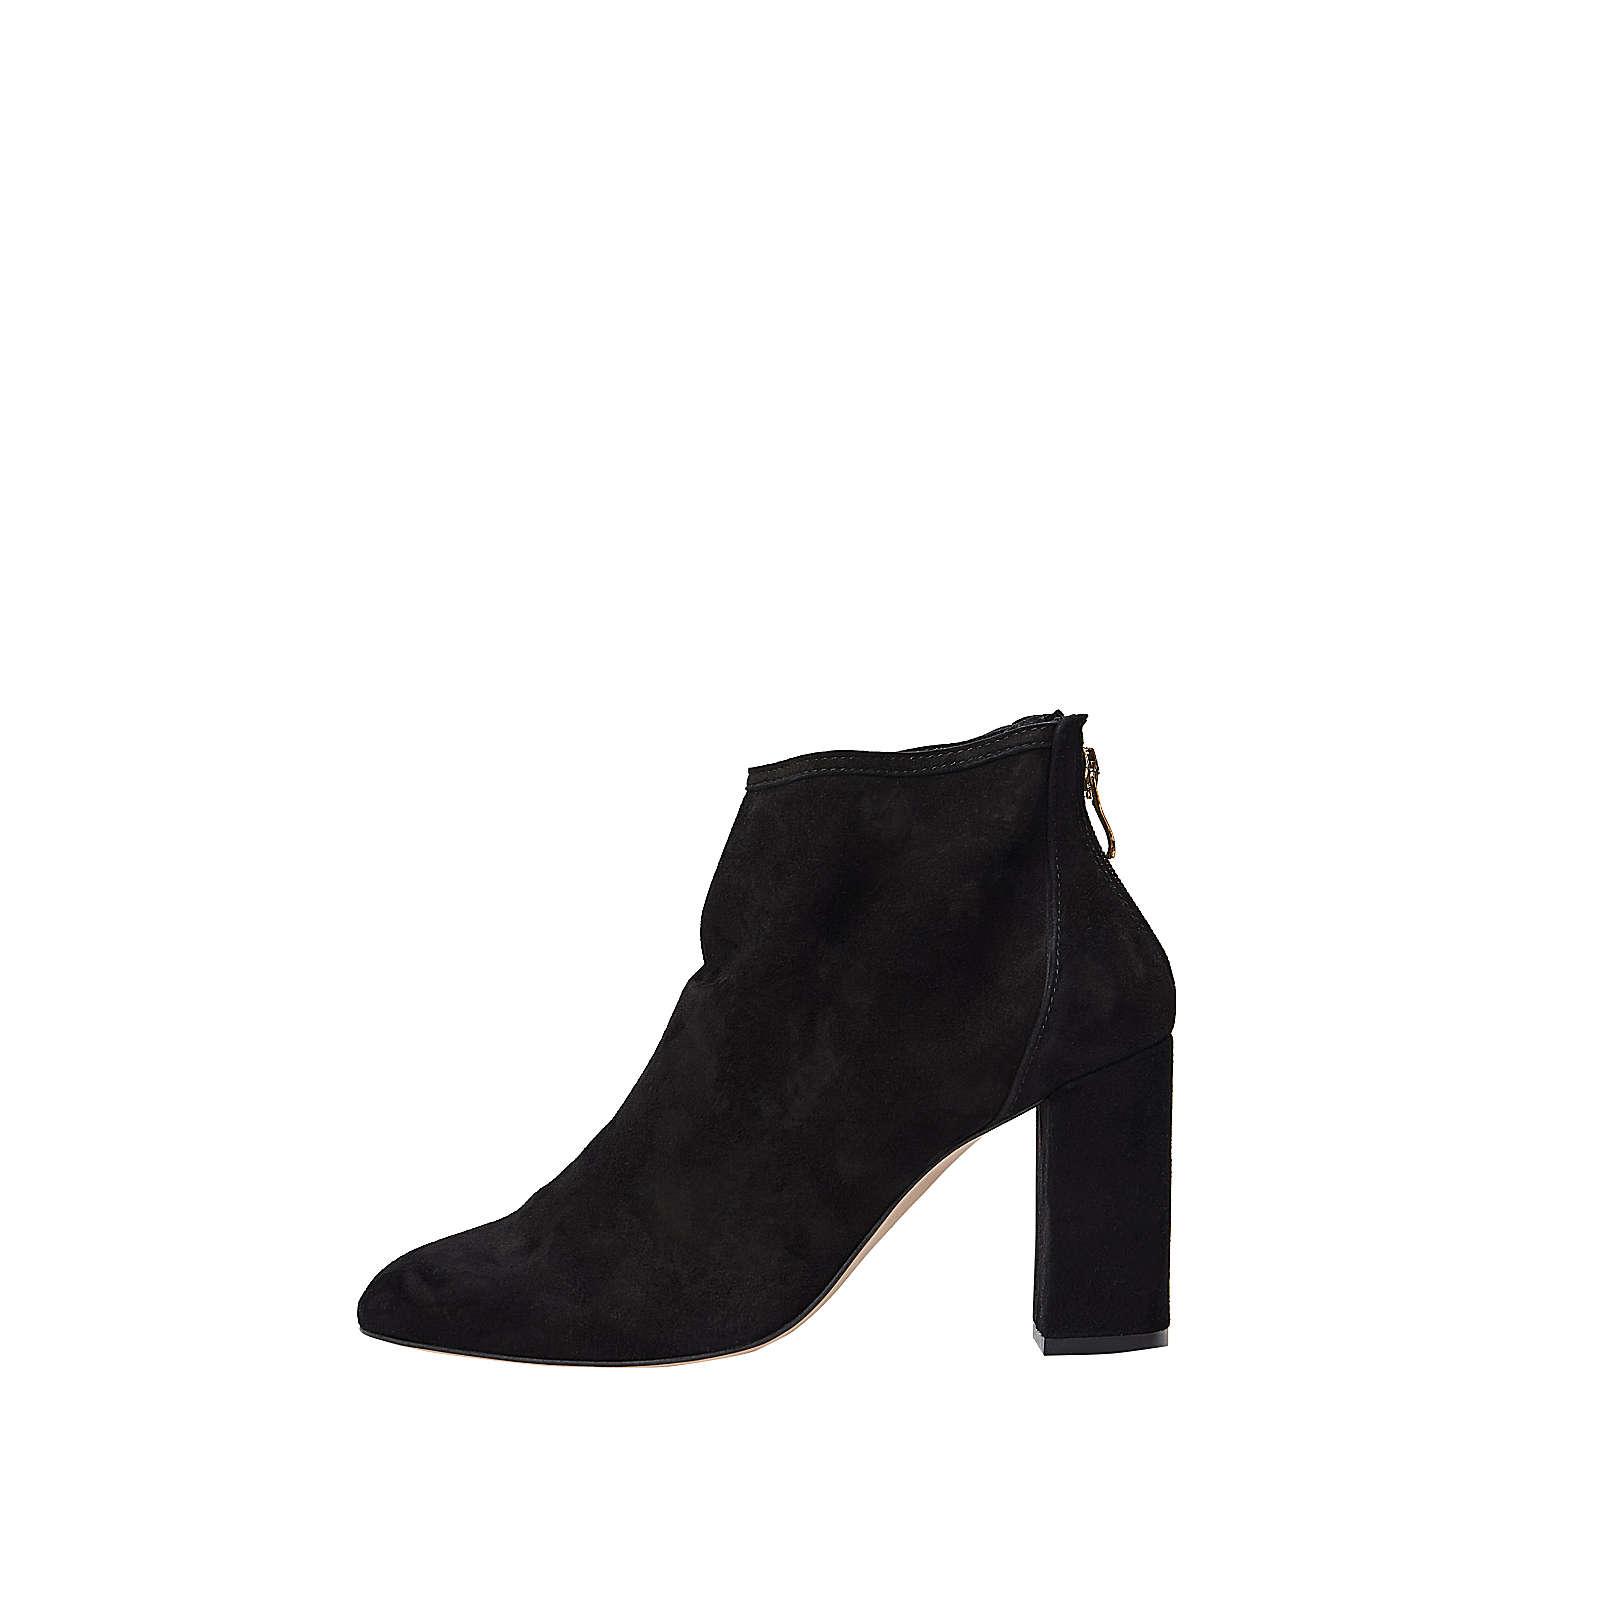 faina Ankle Boots schwarz Damen Gr. 36